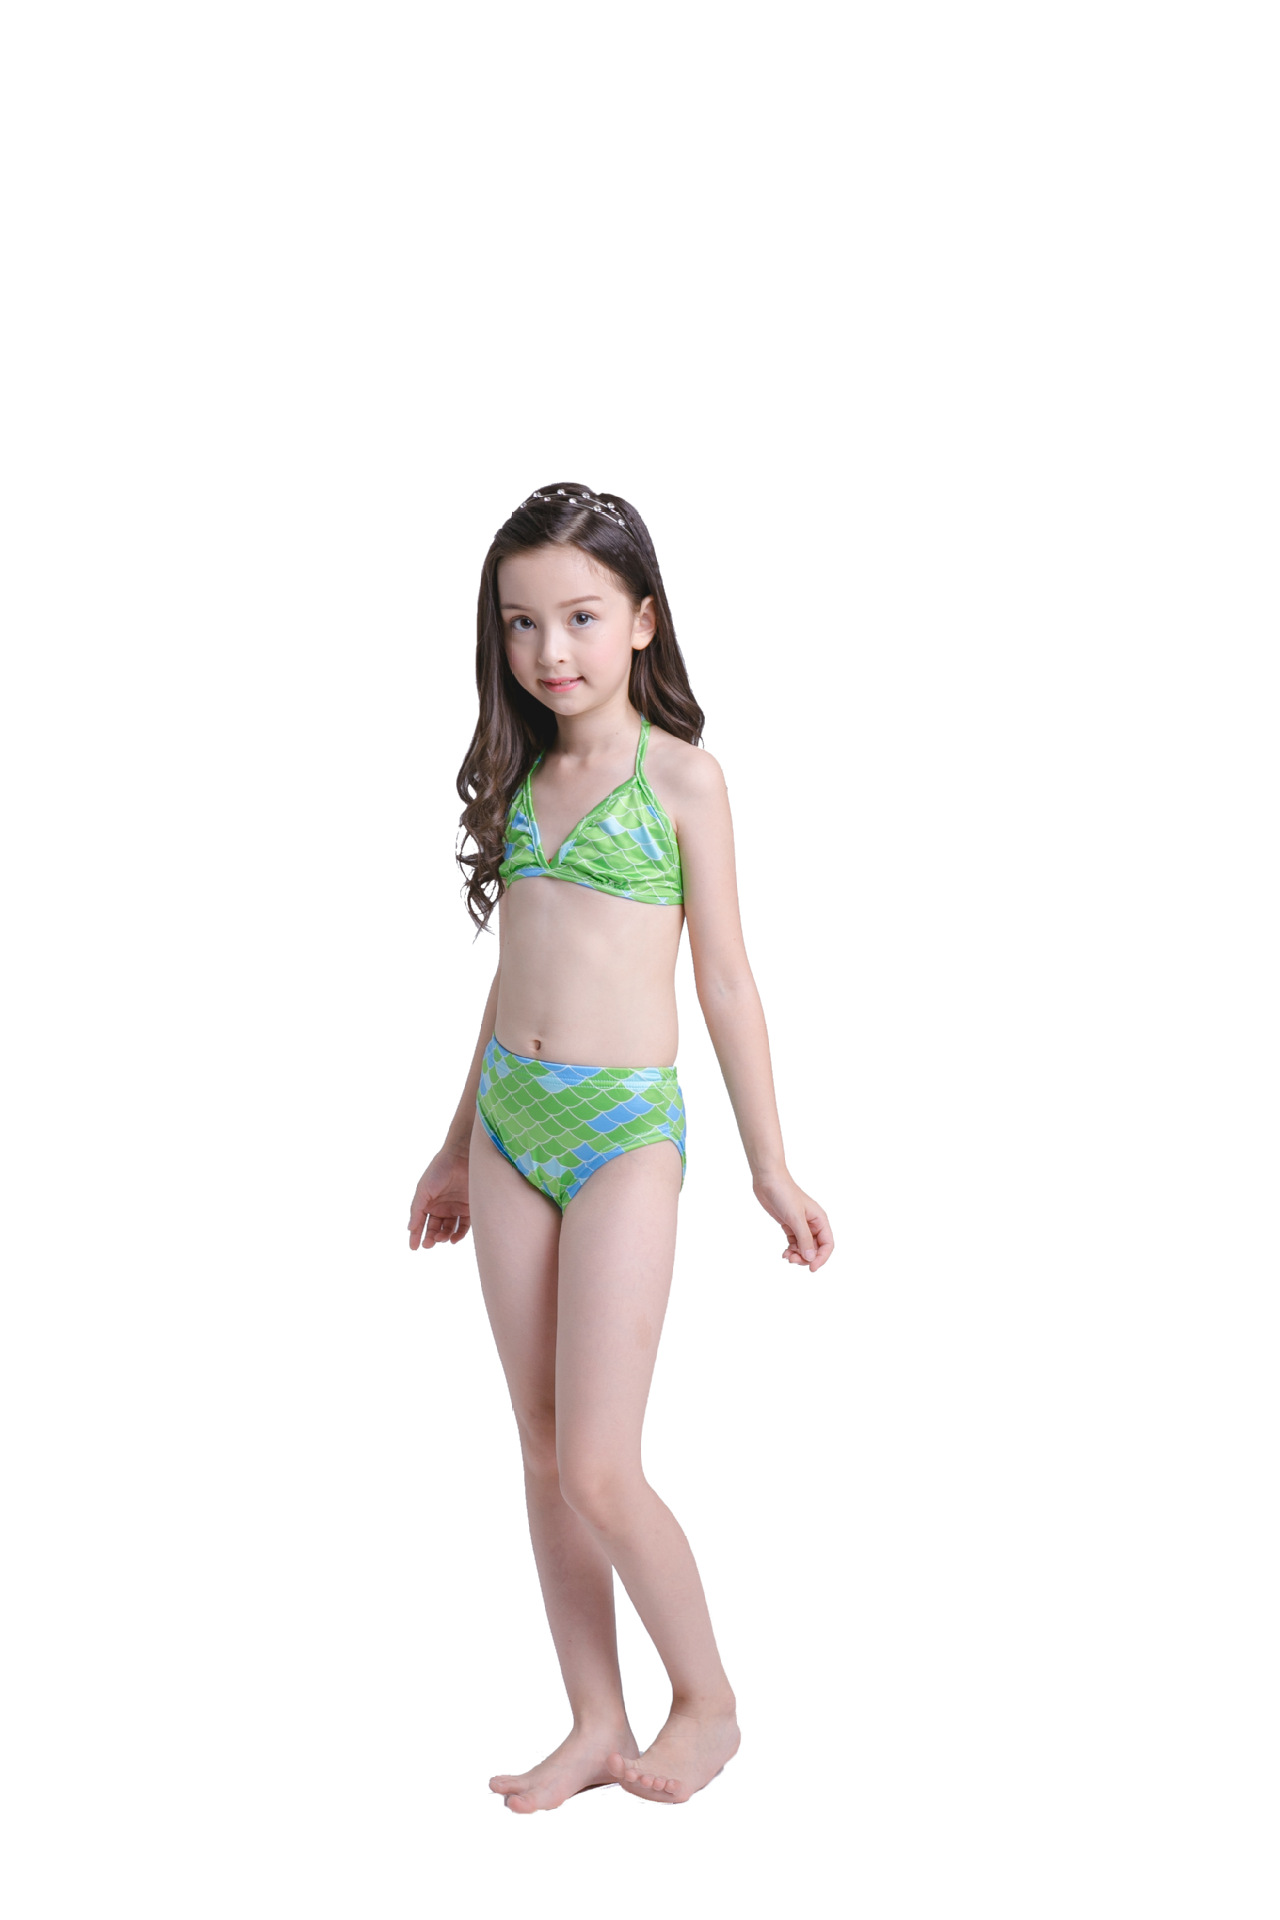 Yy819 5 New Fashion European And American Swimwear Children Mermaid Swimming Clothes Childrens Swimsuit Girl Bikini Mother & Kids